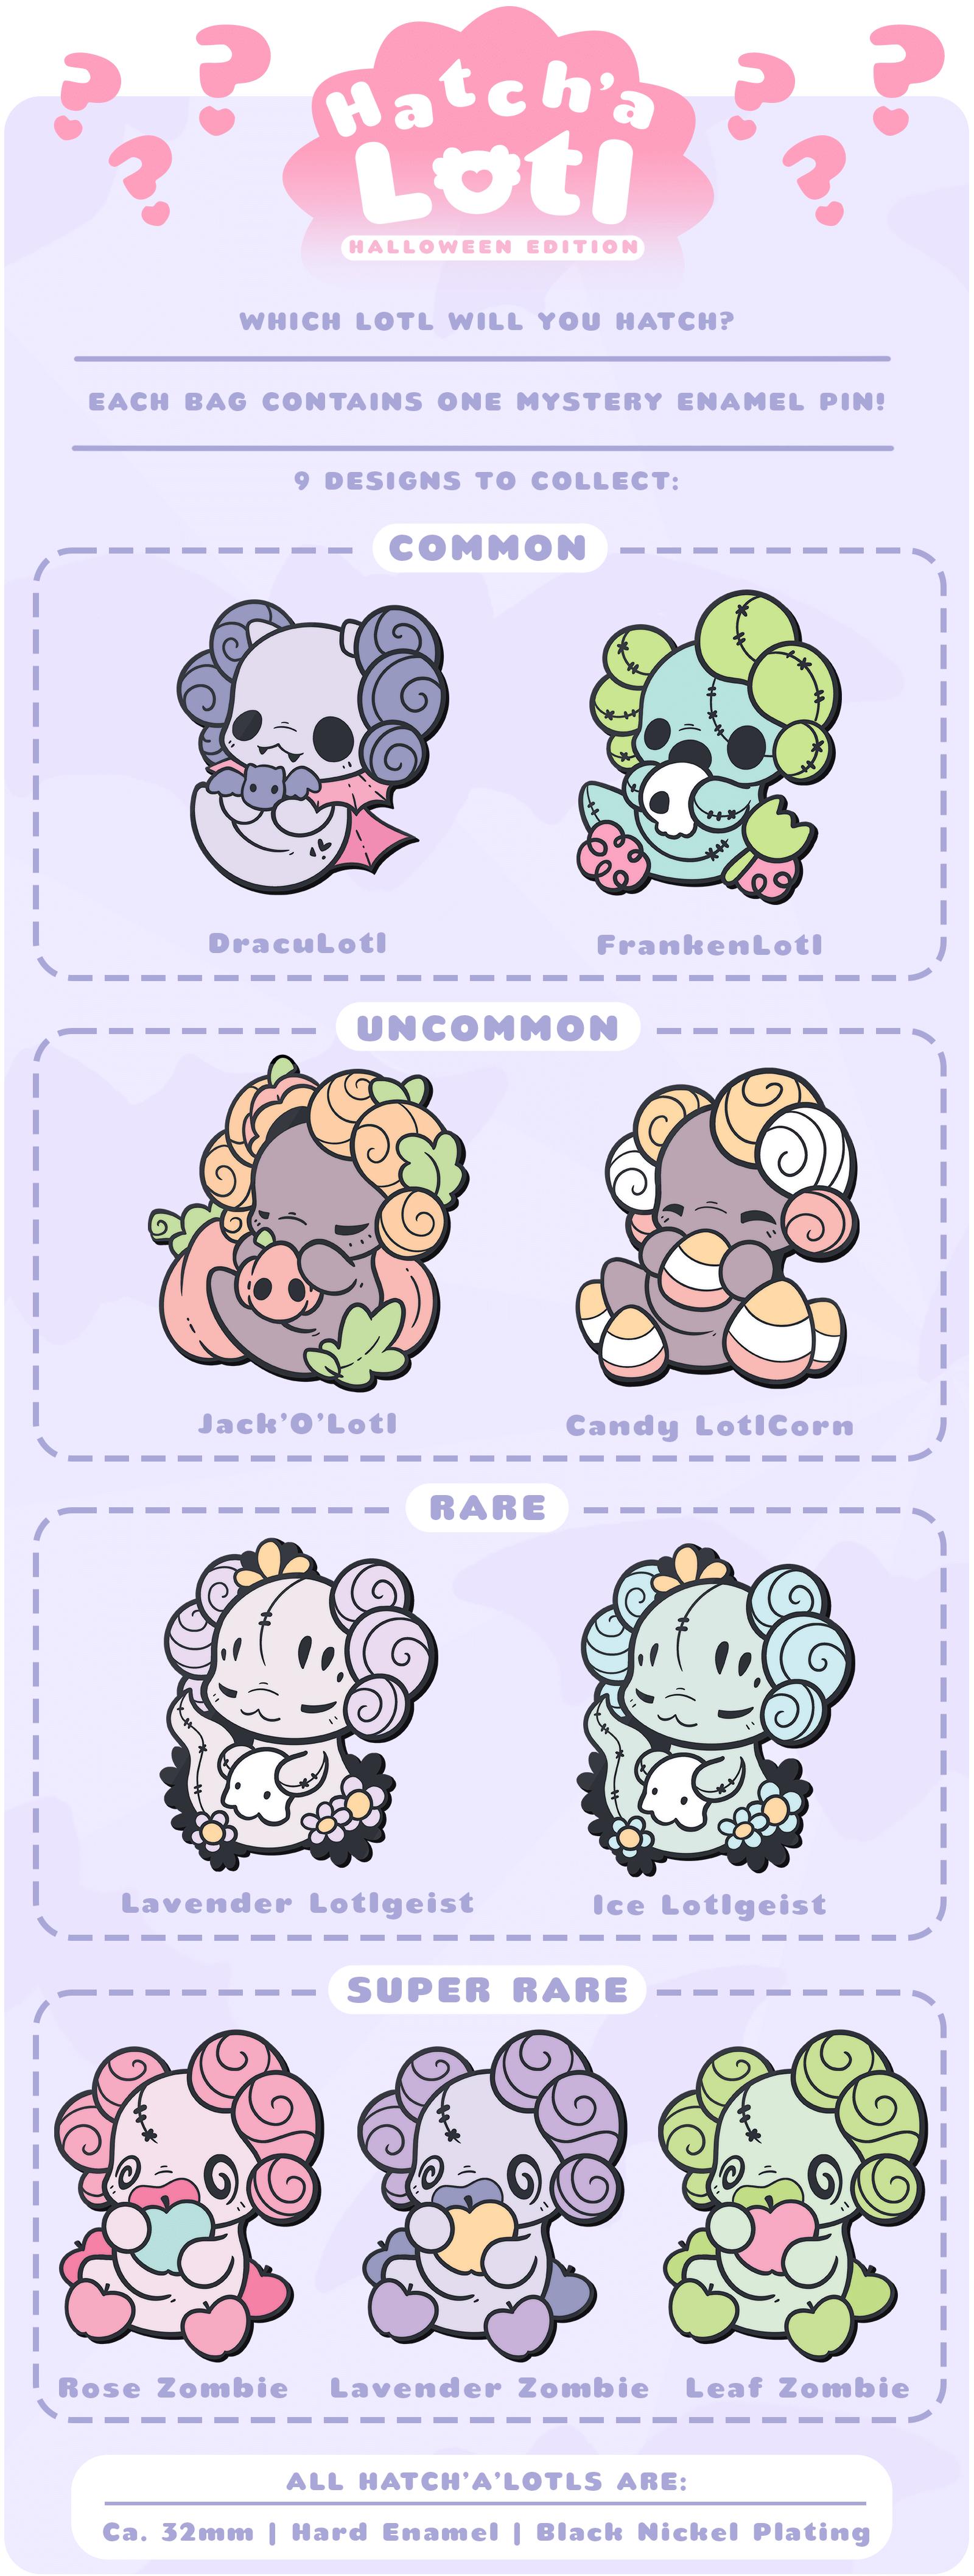 "Common designs: DracuLotl and FrankenLotl. Uncommon designs: Jack'O'Lotl and LotlCorn. Rare designs: Lavender Lotlgeist and Ice Lotlgeist. Super rare (""legendary"" designs: Rose Zombie Lotl, Lavender Zombie Lotl, and Leaf Zombie Lotl."